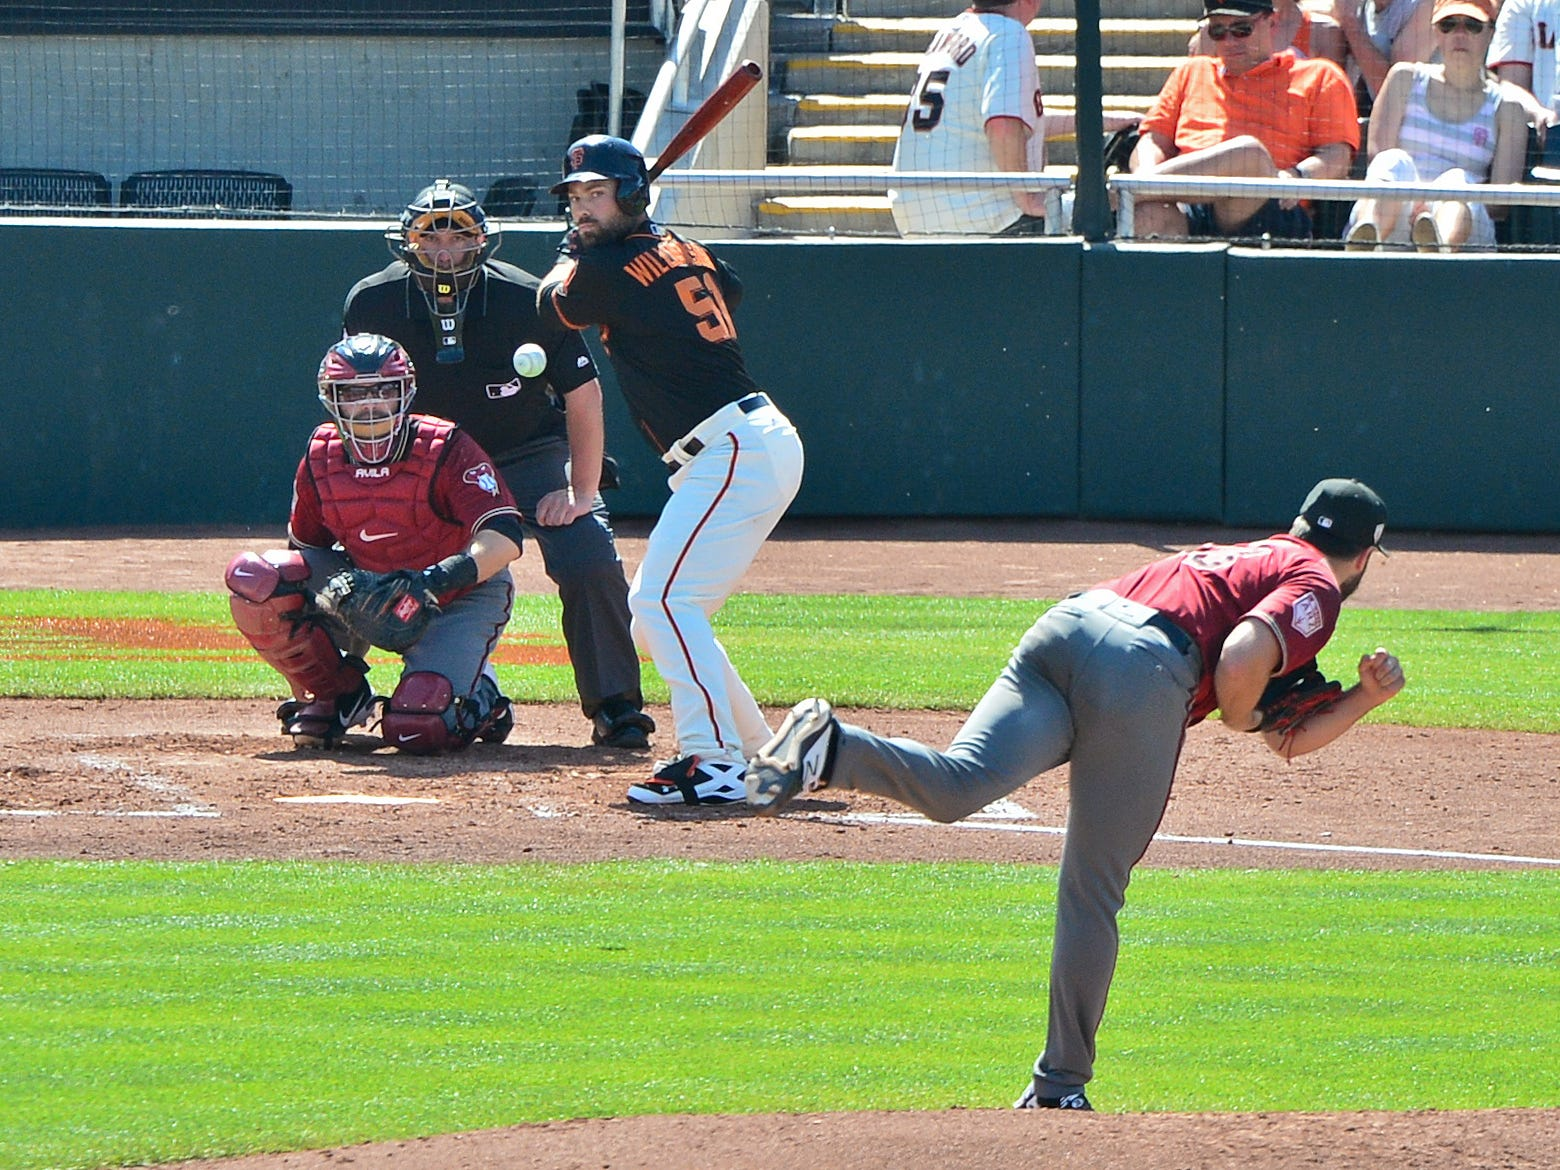 Mar 23, 2019; Scottsdale, AZ, USA; Arizona Diamondbacks starting pitcher Robbie Ray (38) throws to San Francisco Giants left fielder Mac Williamson (51) during the fourth inning at Scottsdale Stadium.